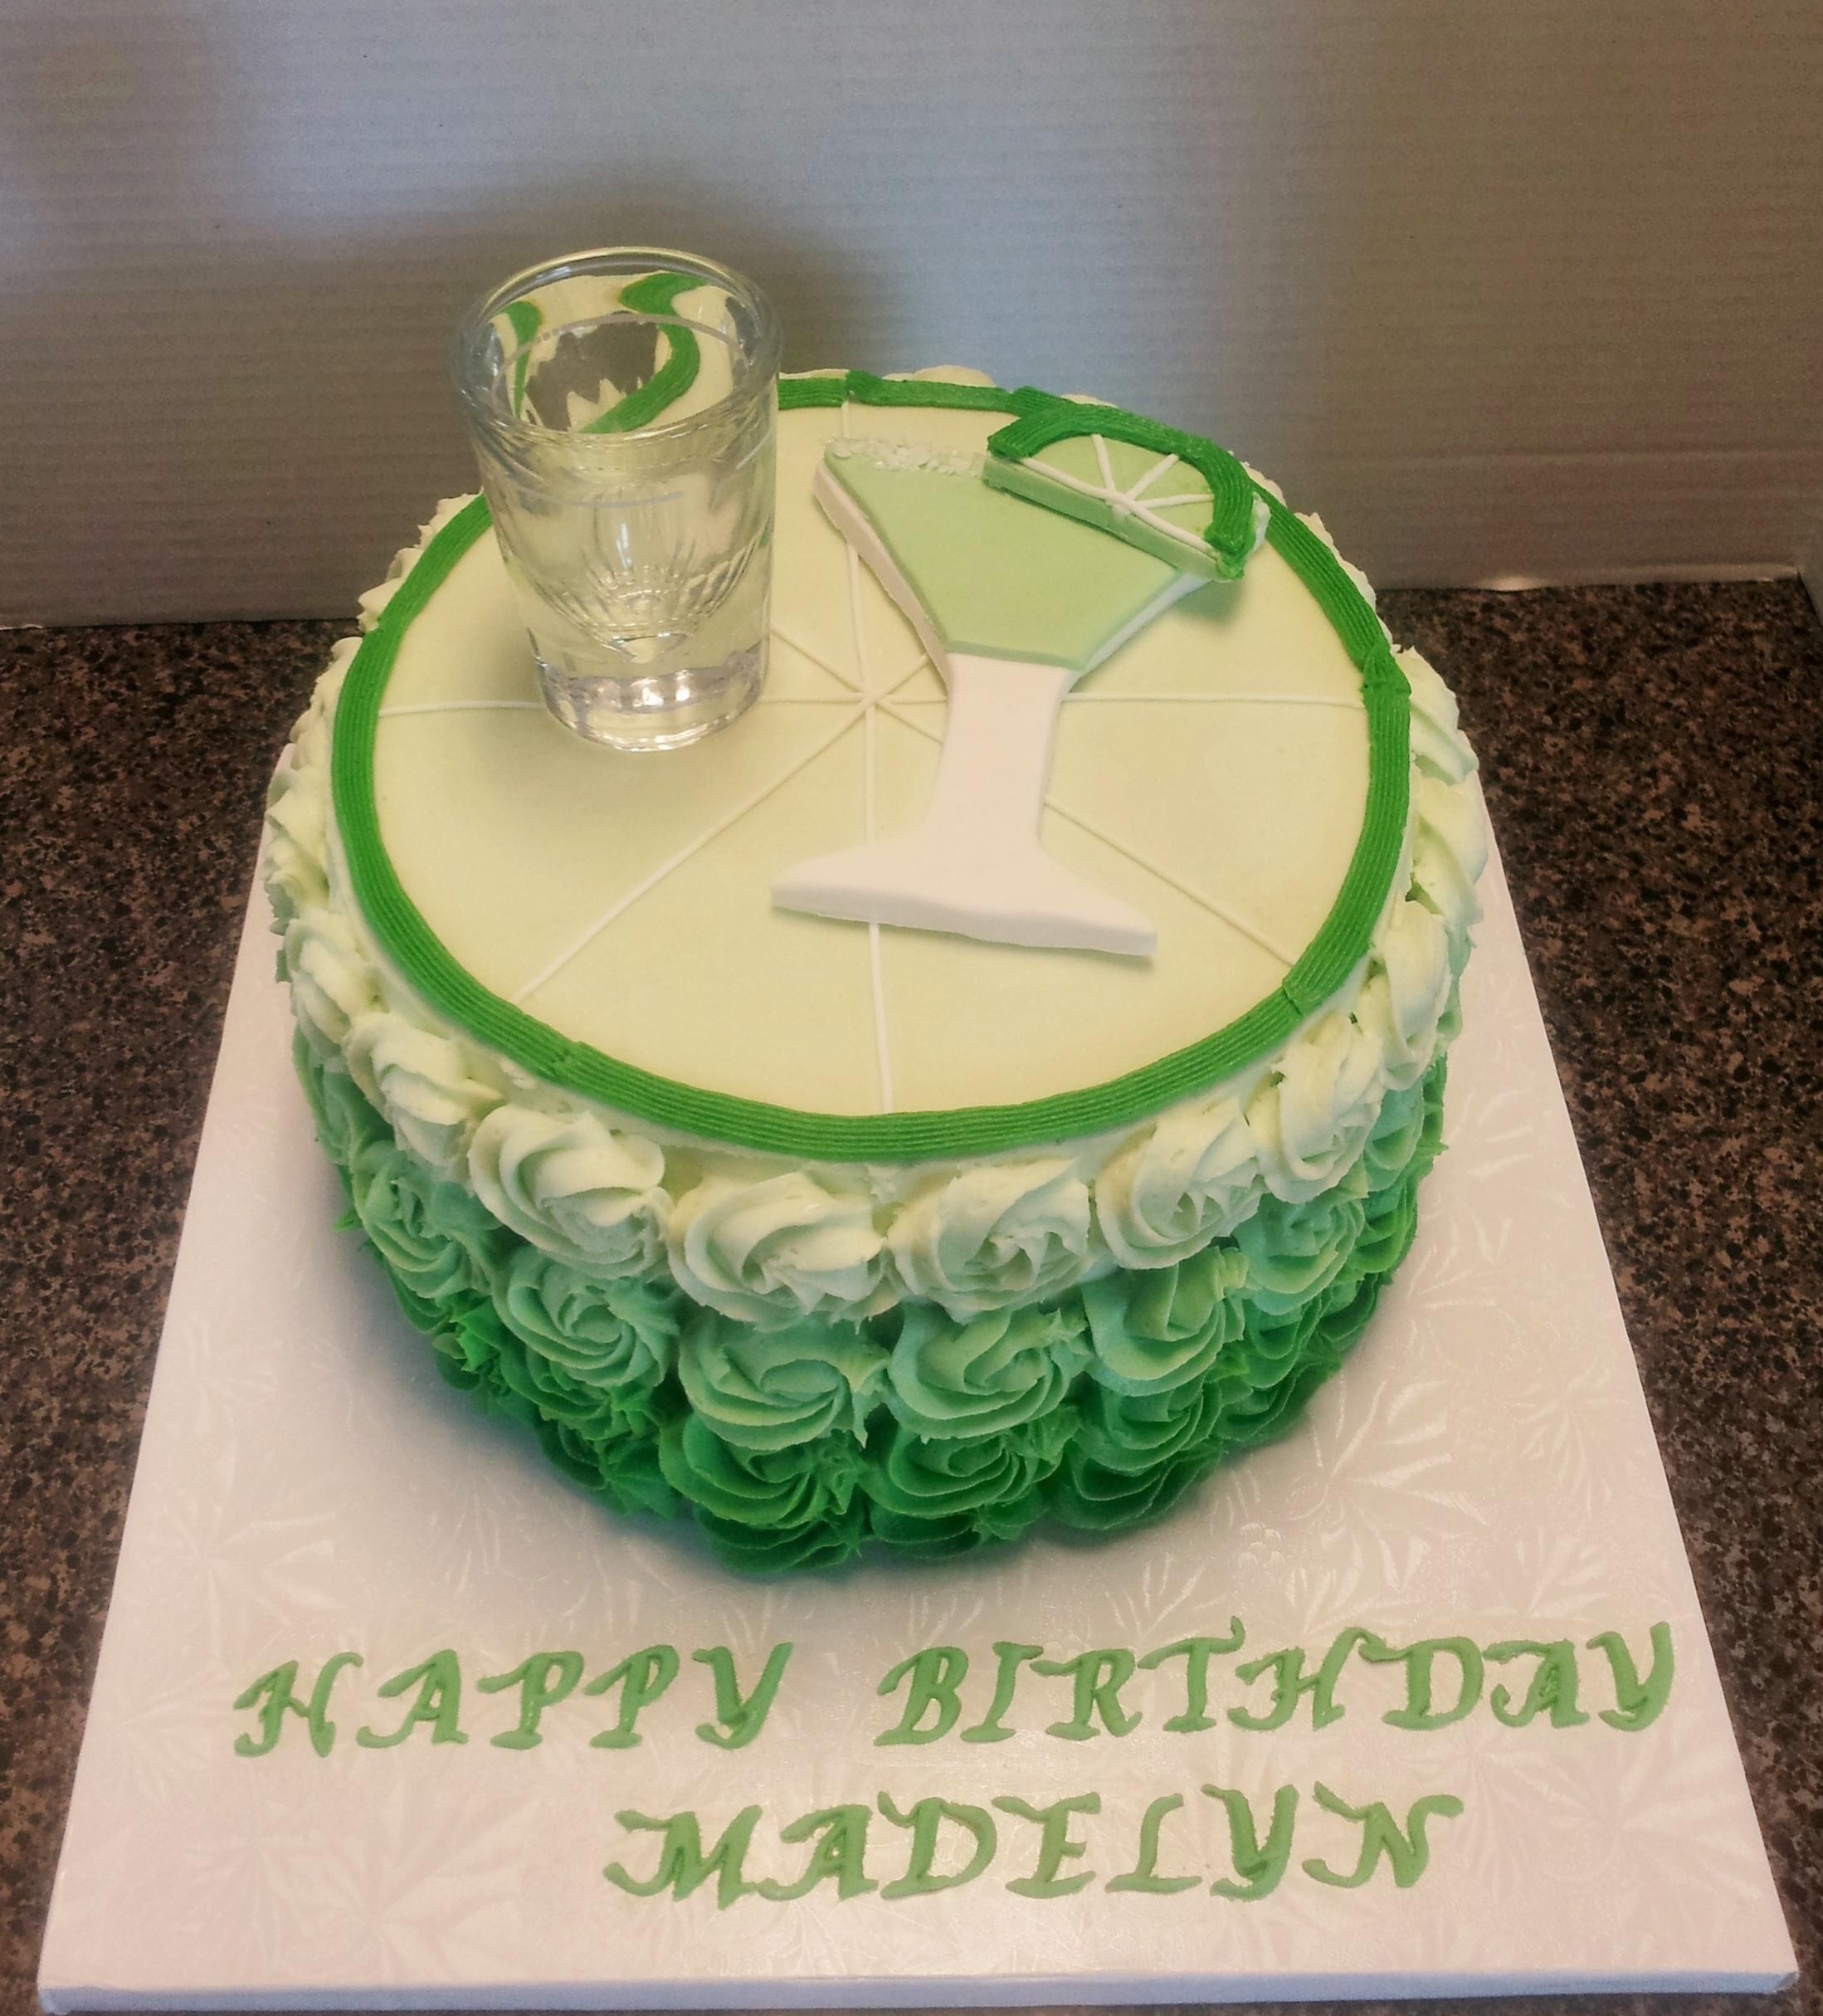 11 Cool Shot Glasses For Men Birthday Cakes Photo 30 Birthday Cake